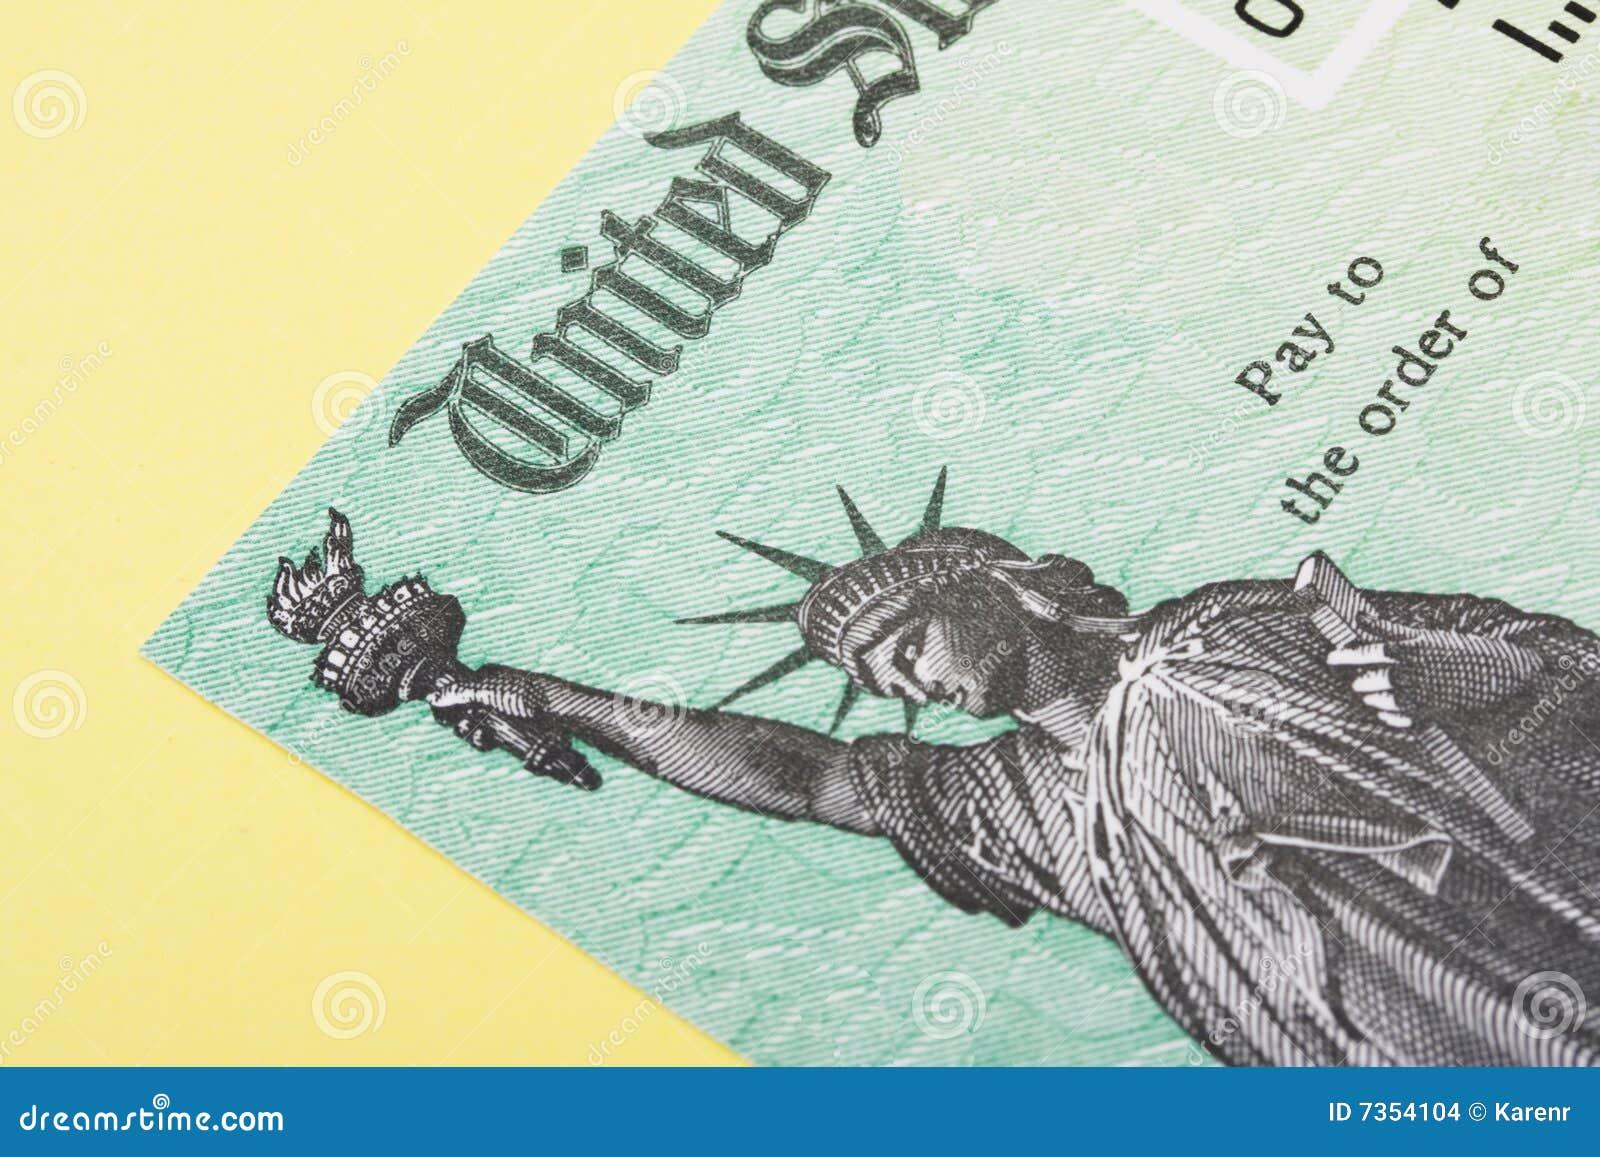 how to pay italian financial transaction tax